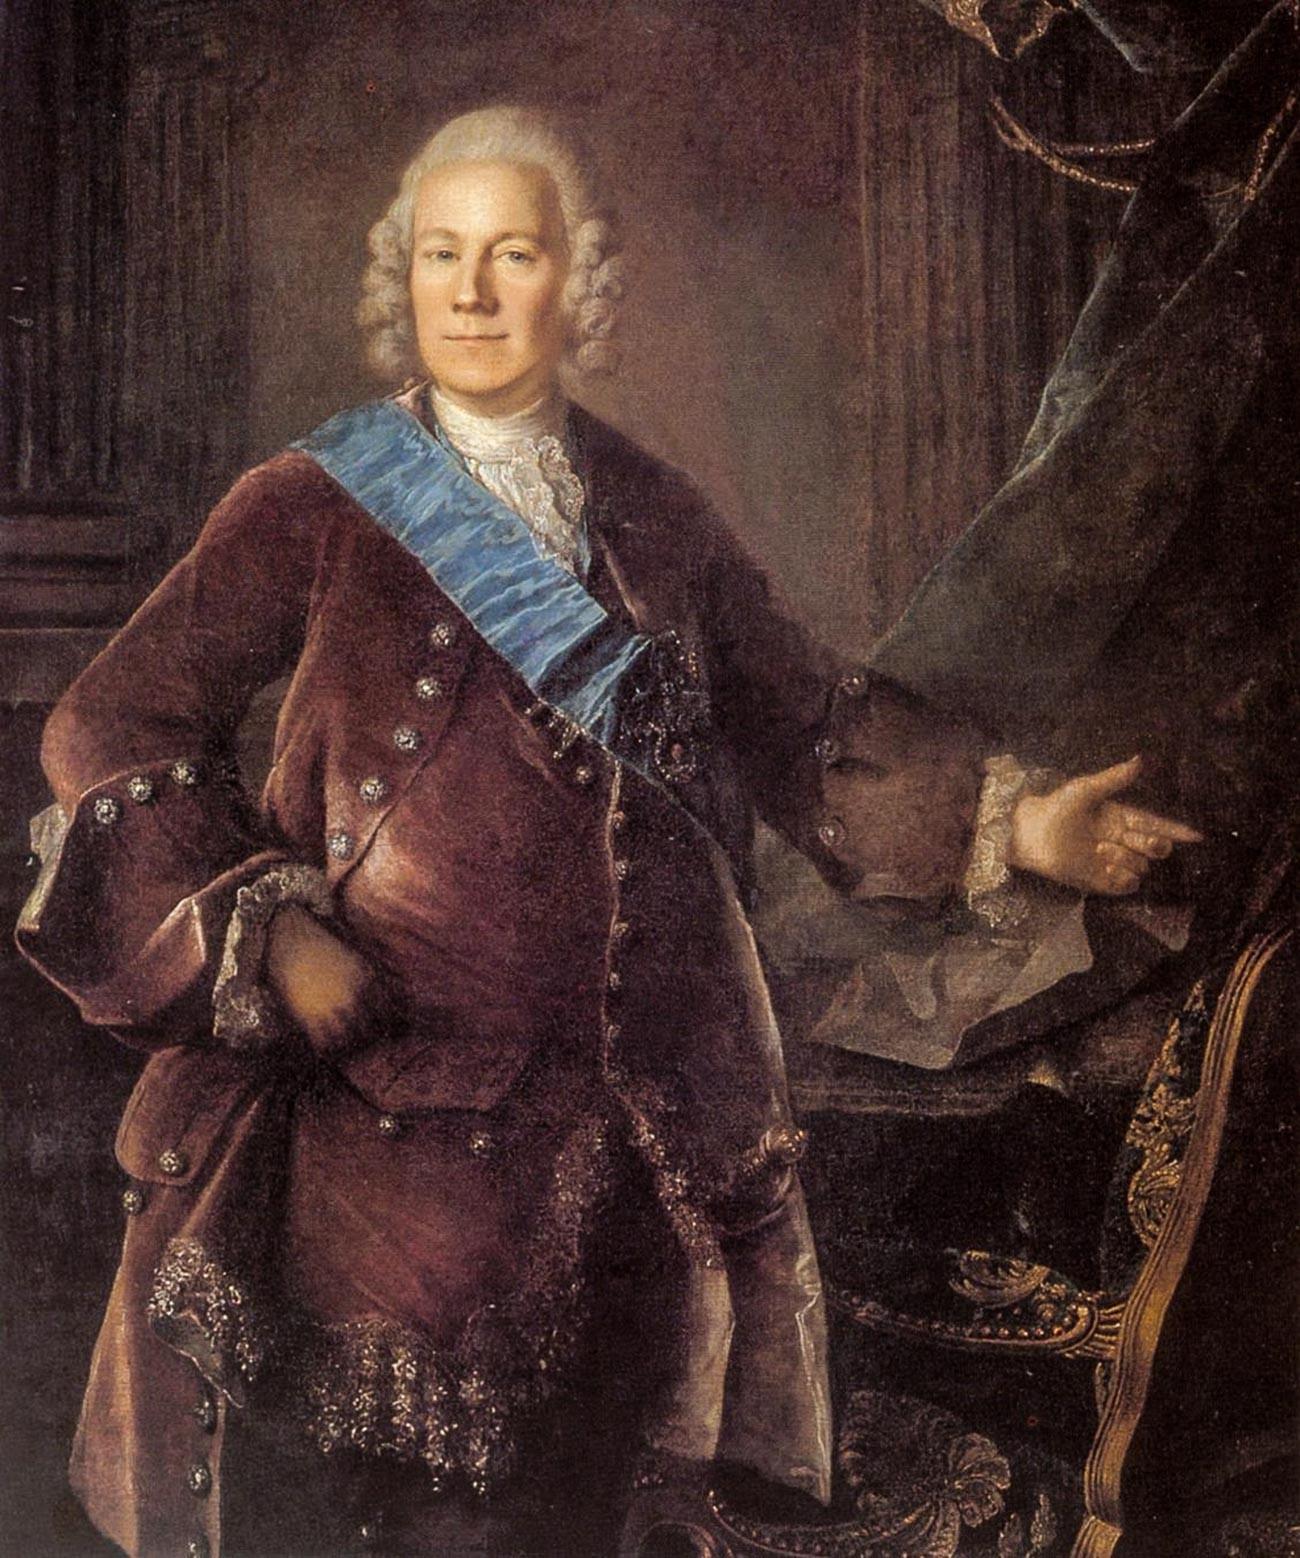 Il conte Aleksej Bestuzhev-Rjumin